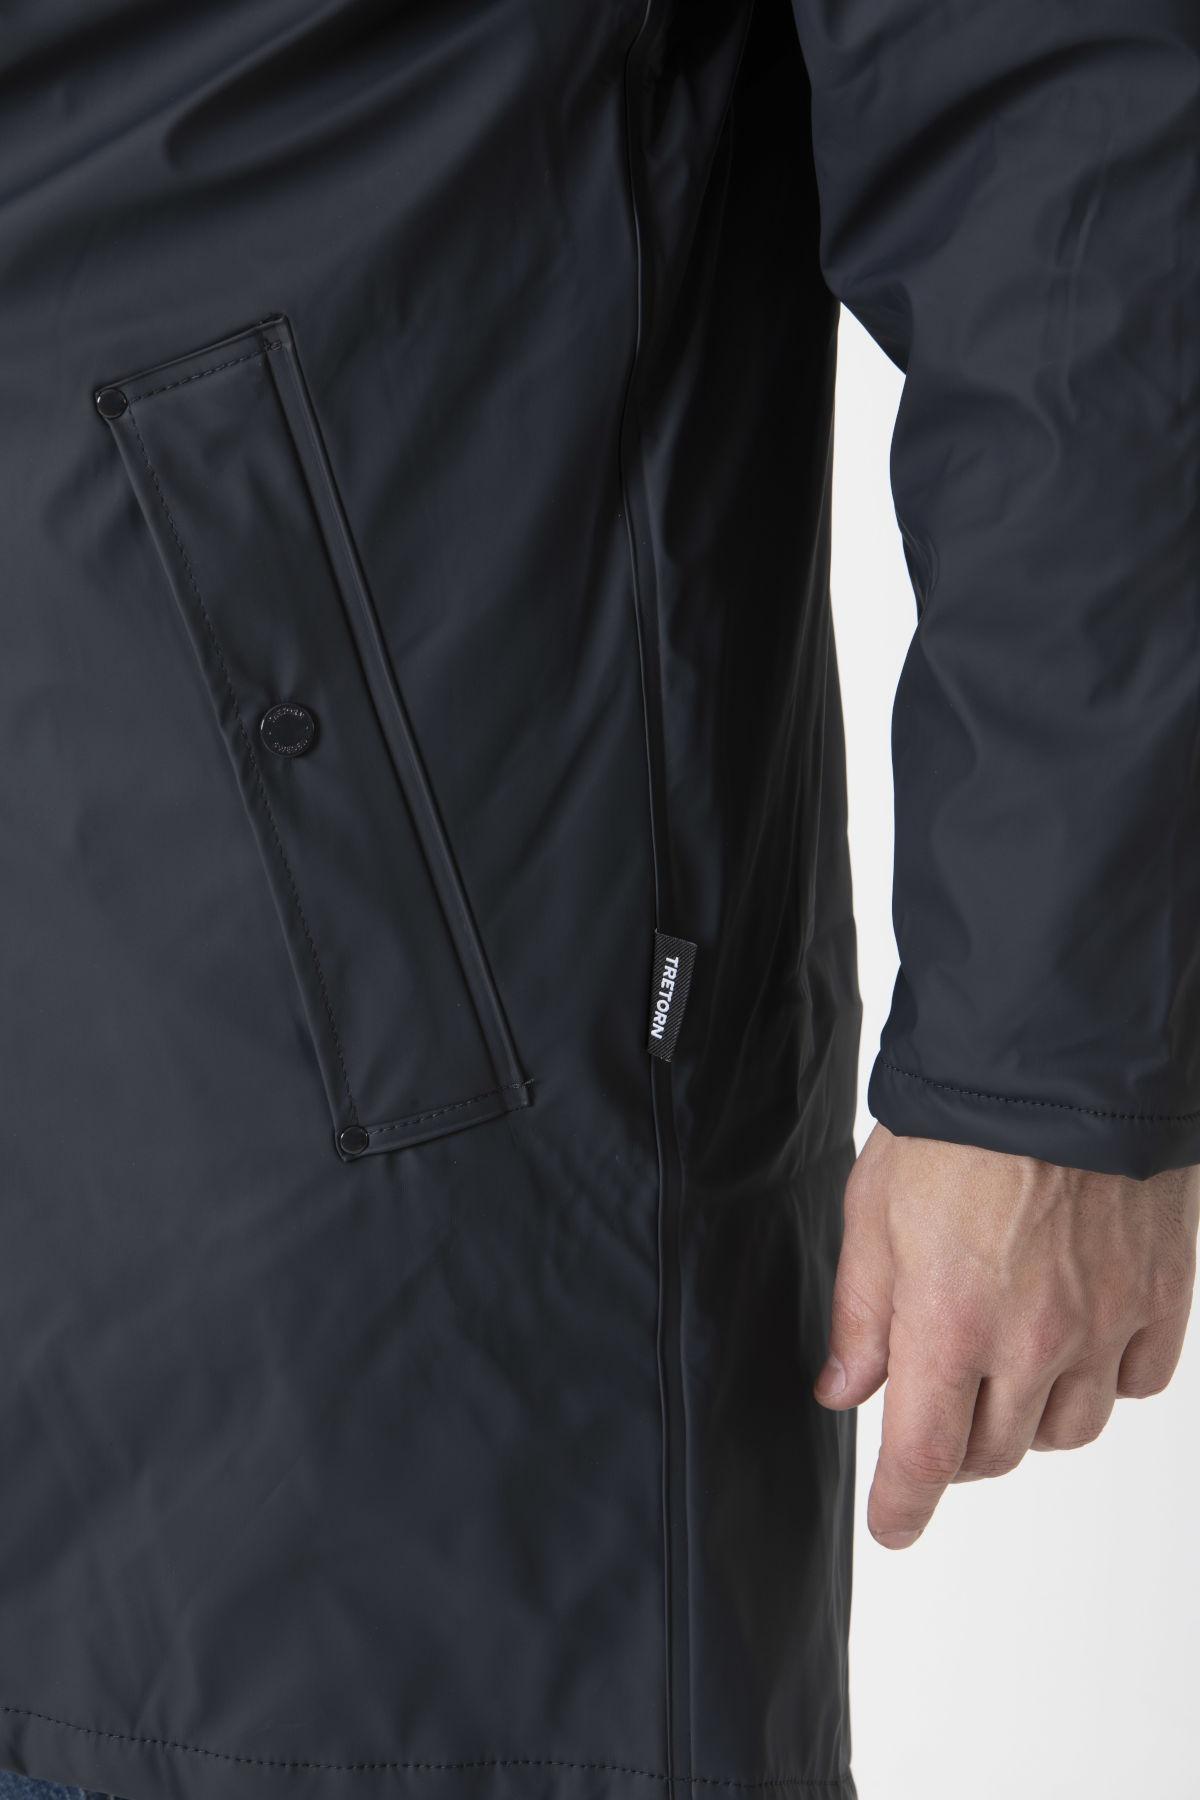 WINGS Jacket for man TRETORN F/W 19-20